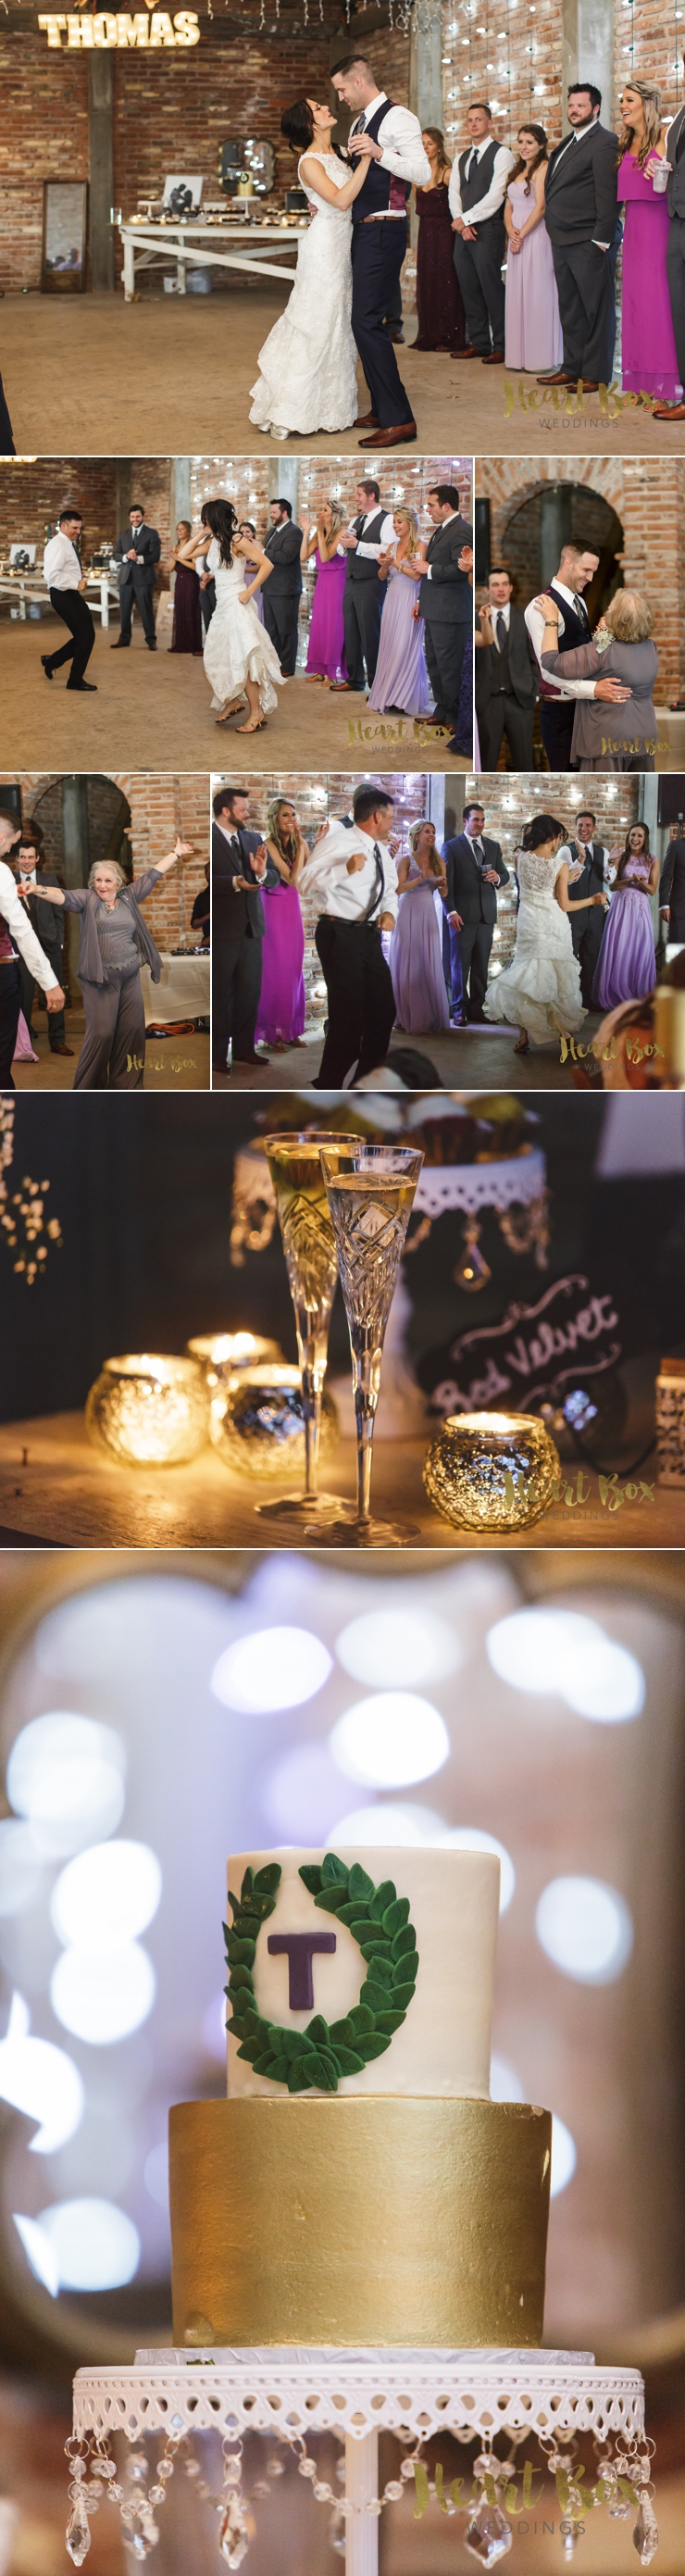 Thomas Wedding Blog Collages 8.jpg